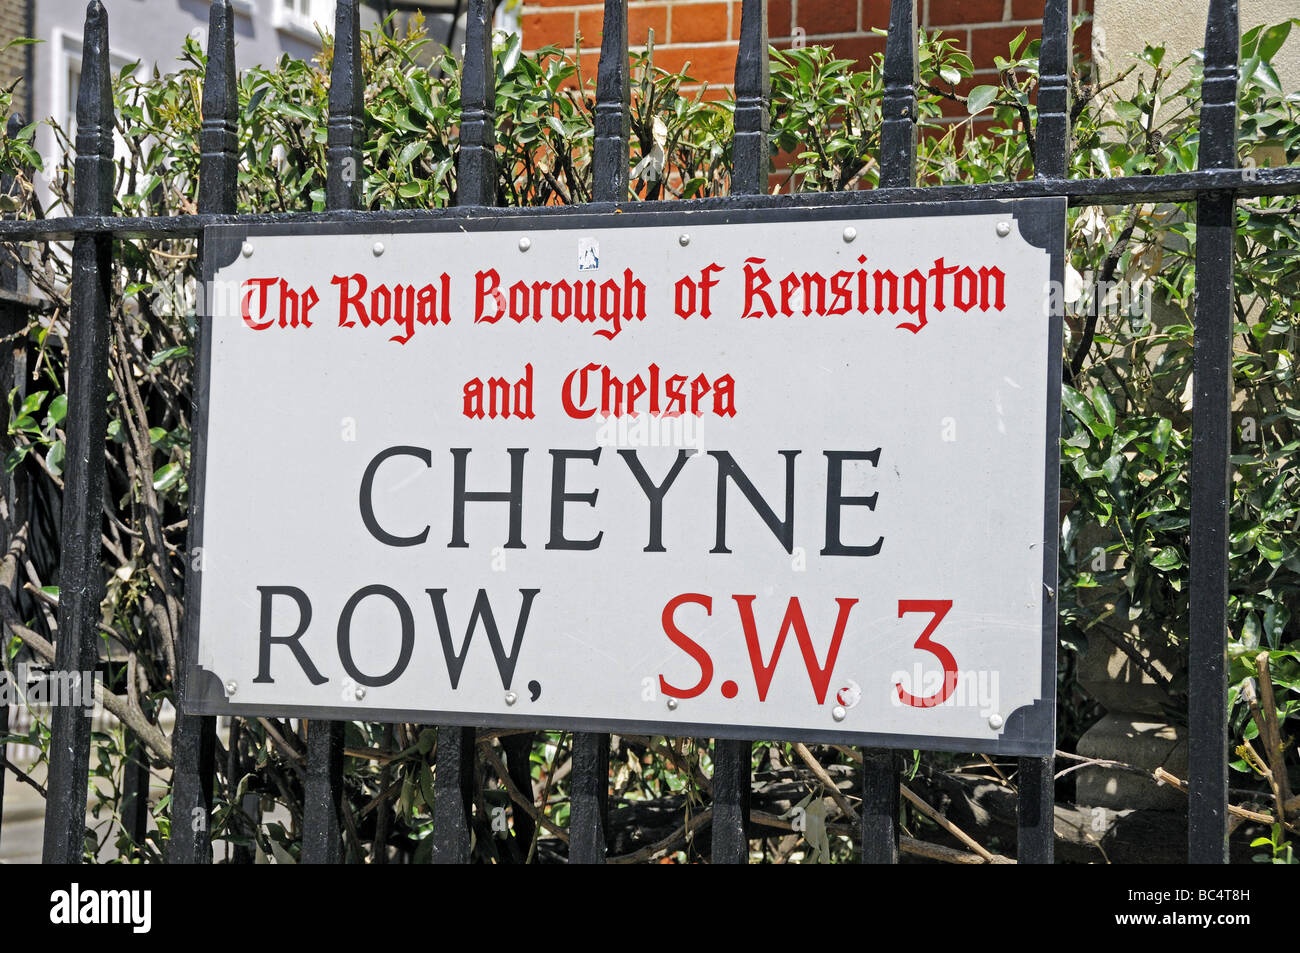 Cheyne Row street sign The Royal Borough of Kensington and Chelsea London SW3 England UK Stock Photo